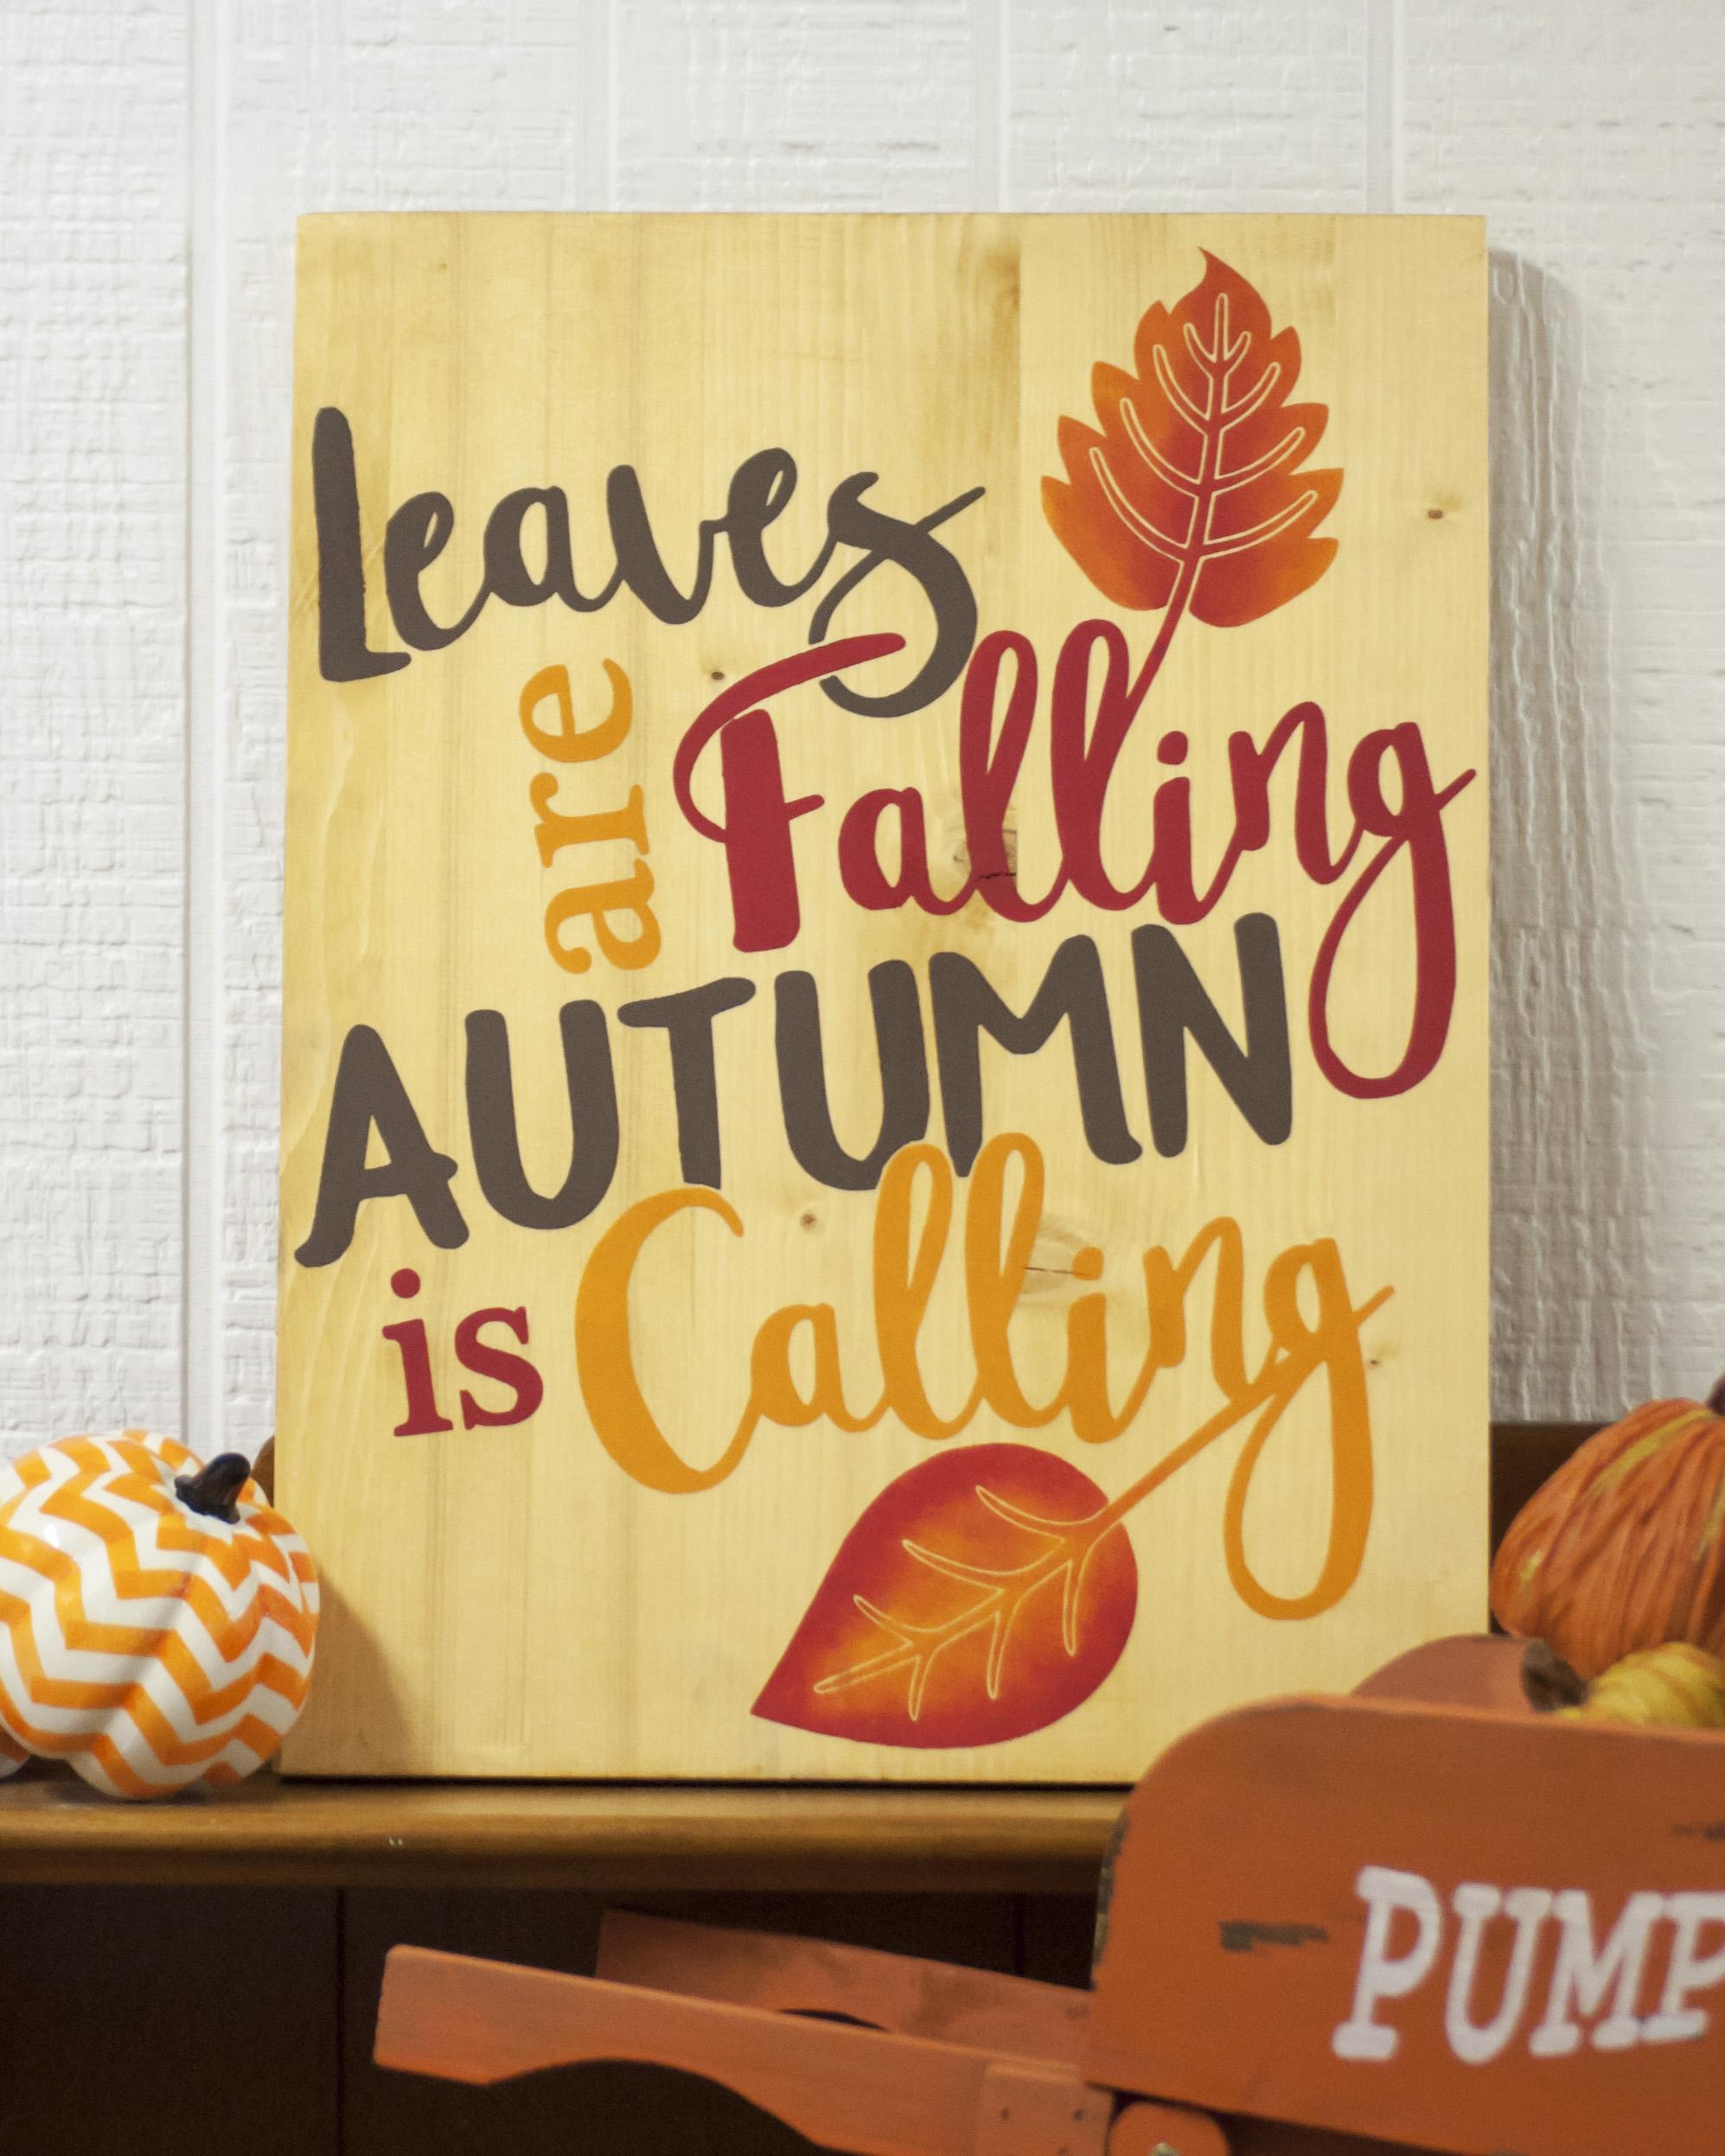 autumn calling.jpg